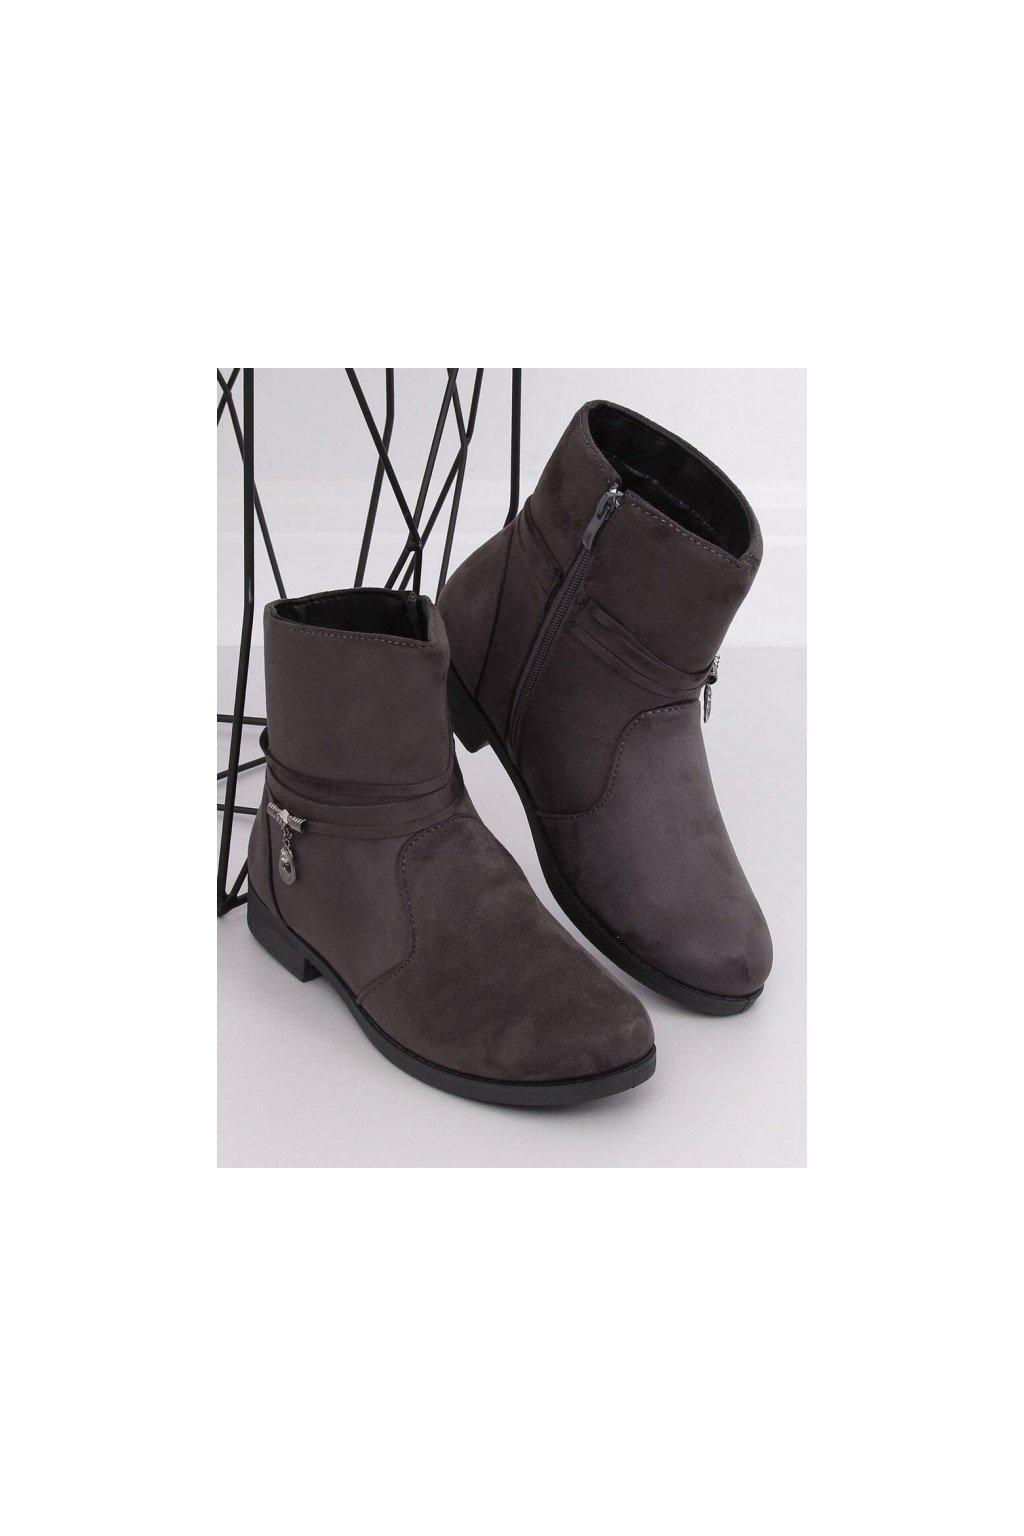 sive clenkove cizmy na nizkom podpatku so zapinanim na zips (1)